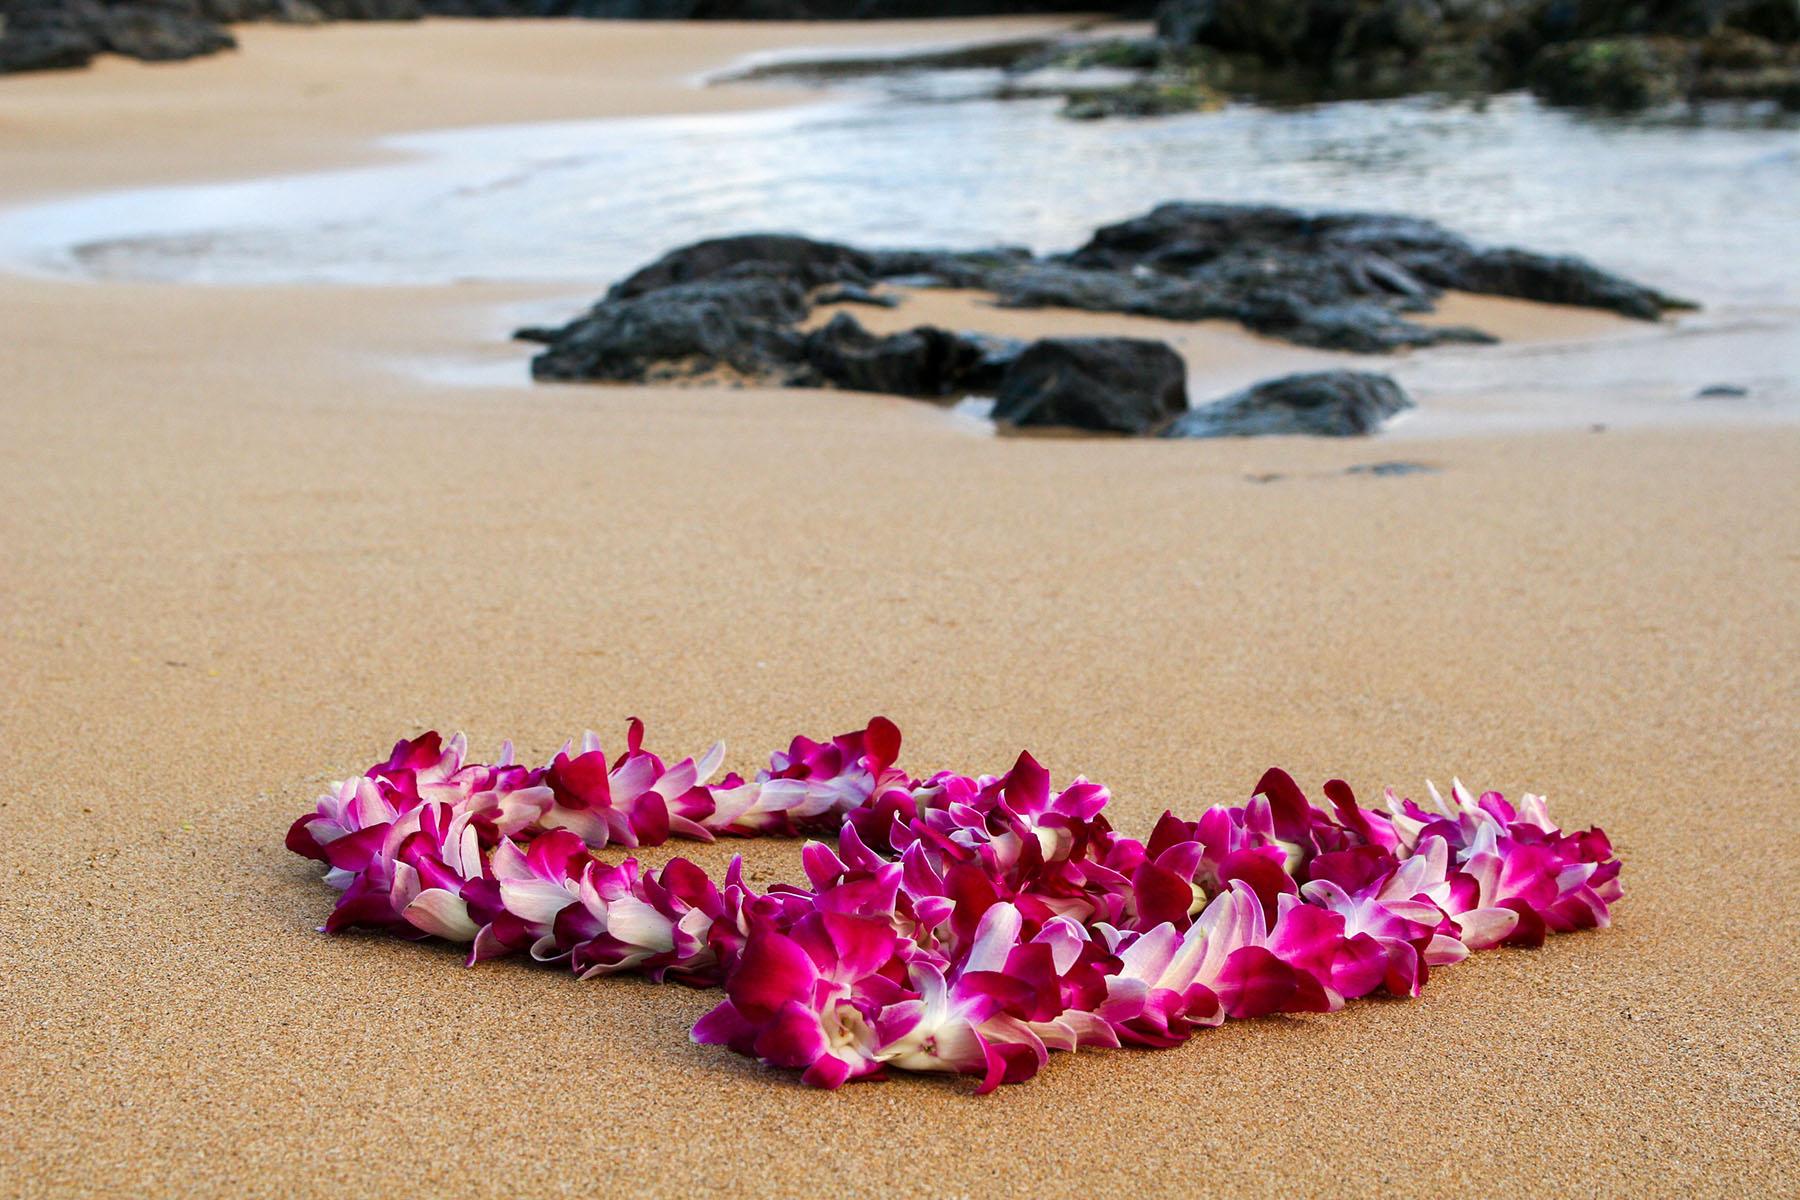 HAWAII-ORCHIDEÁK FÖLDJÉN